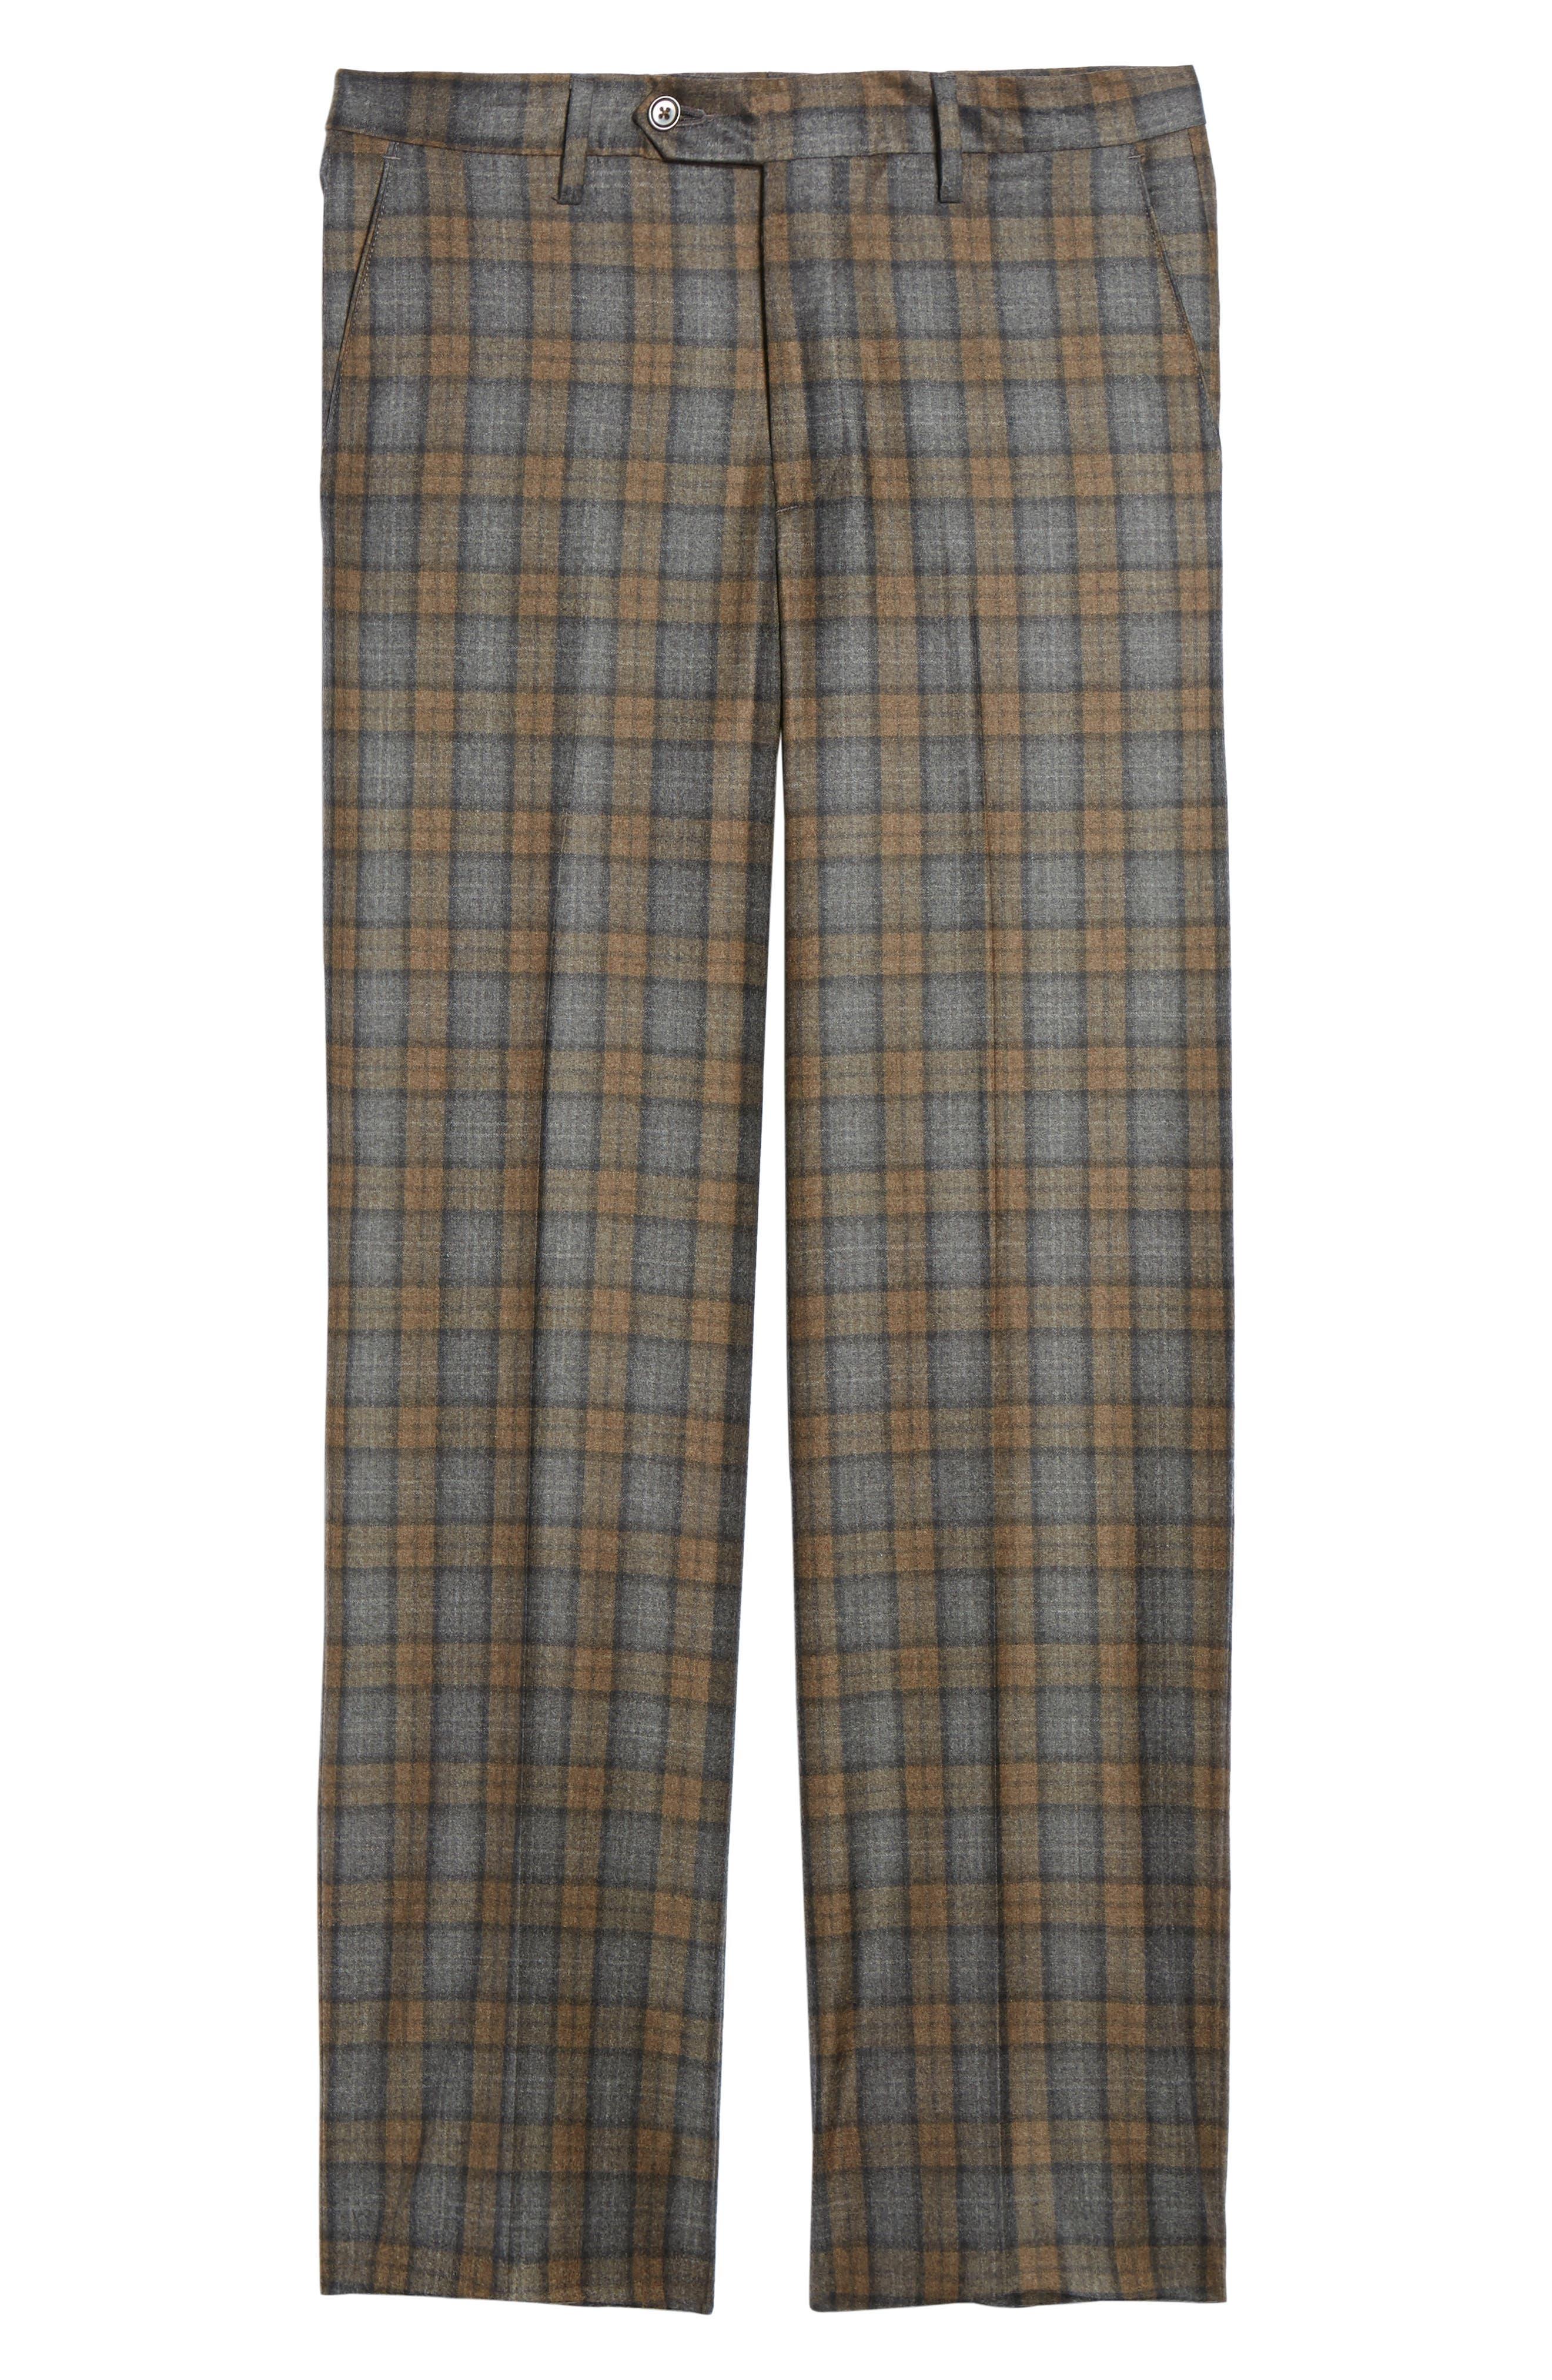 Flat Front Plaid Wool Trousers,                             Alternate thumbnail 6, color,                             Dark Tan